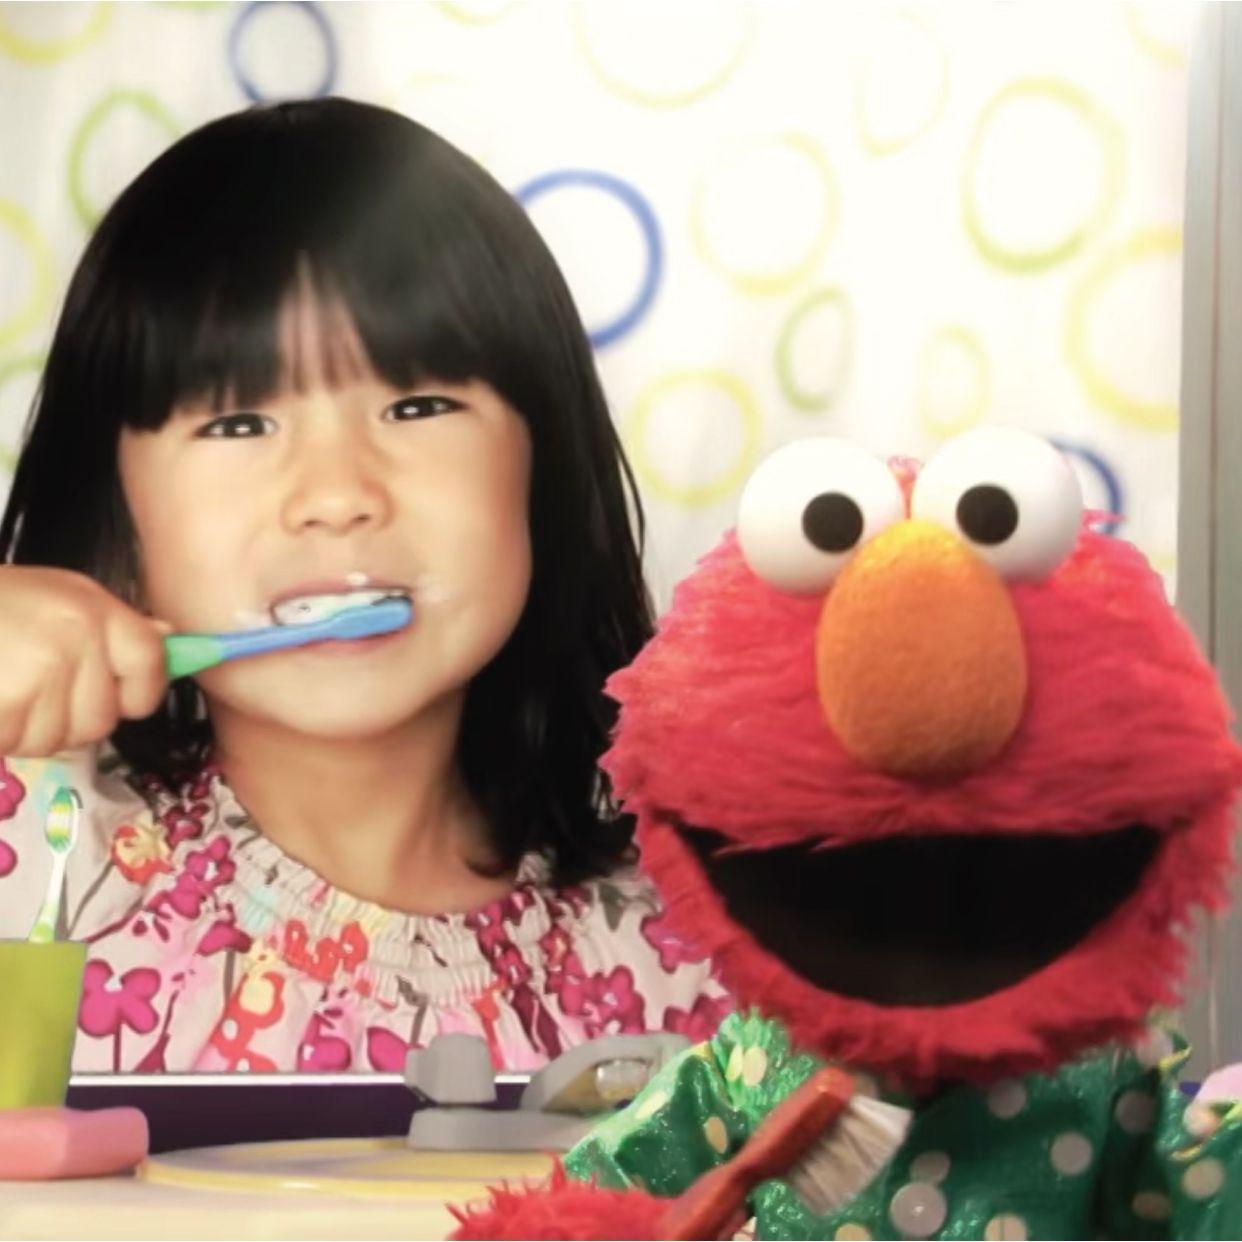 0bc8f51be4d24b228705d348a99ba89c - How To Get In The Habit Of Brushing My Teeth